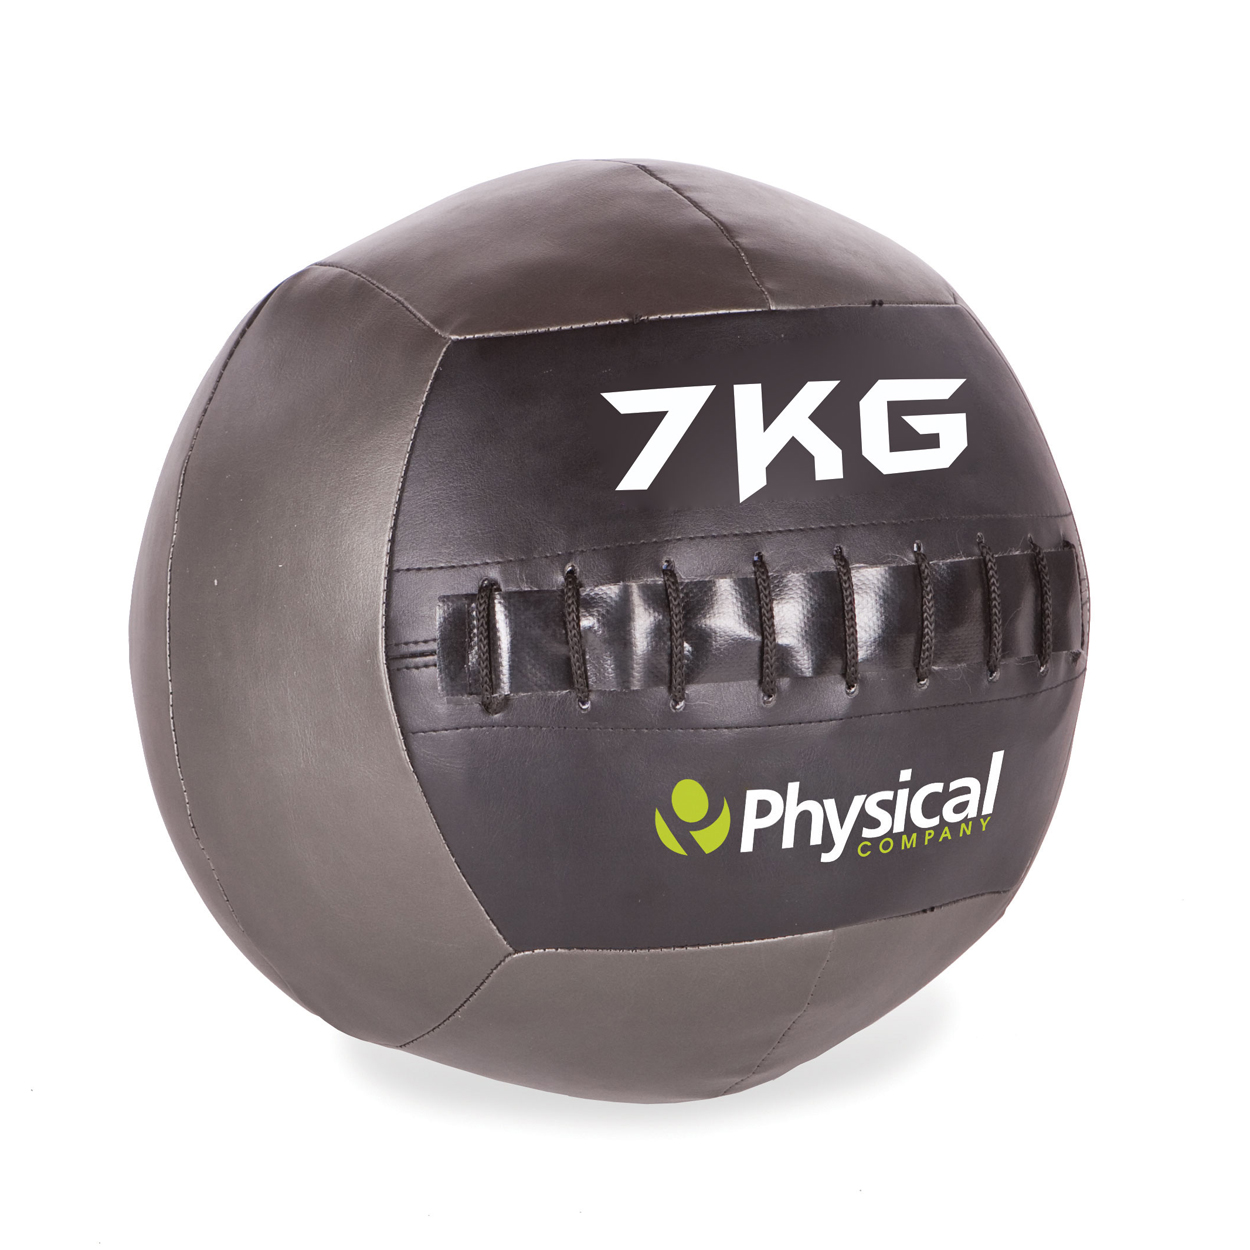 7kg Wall Ball